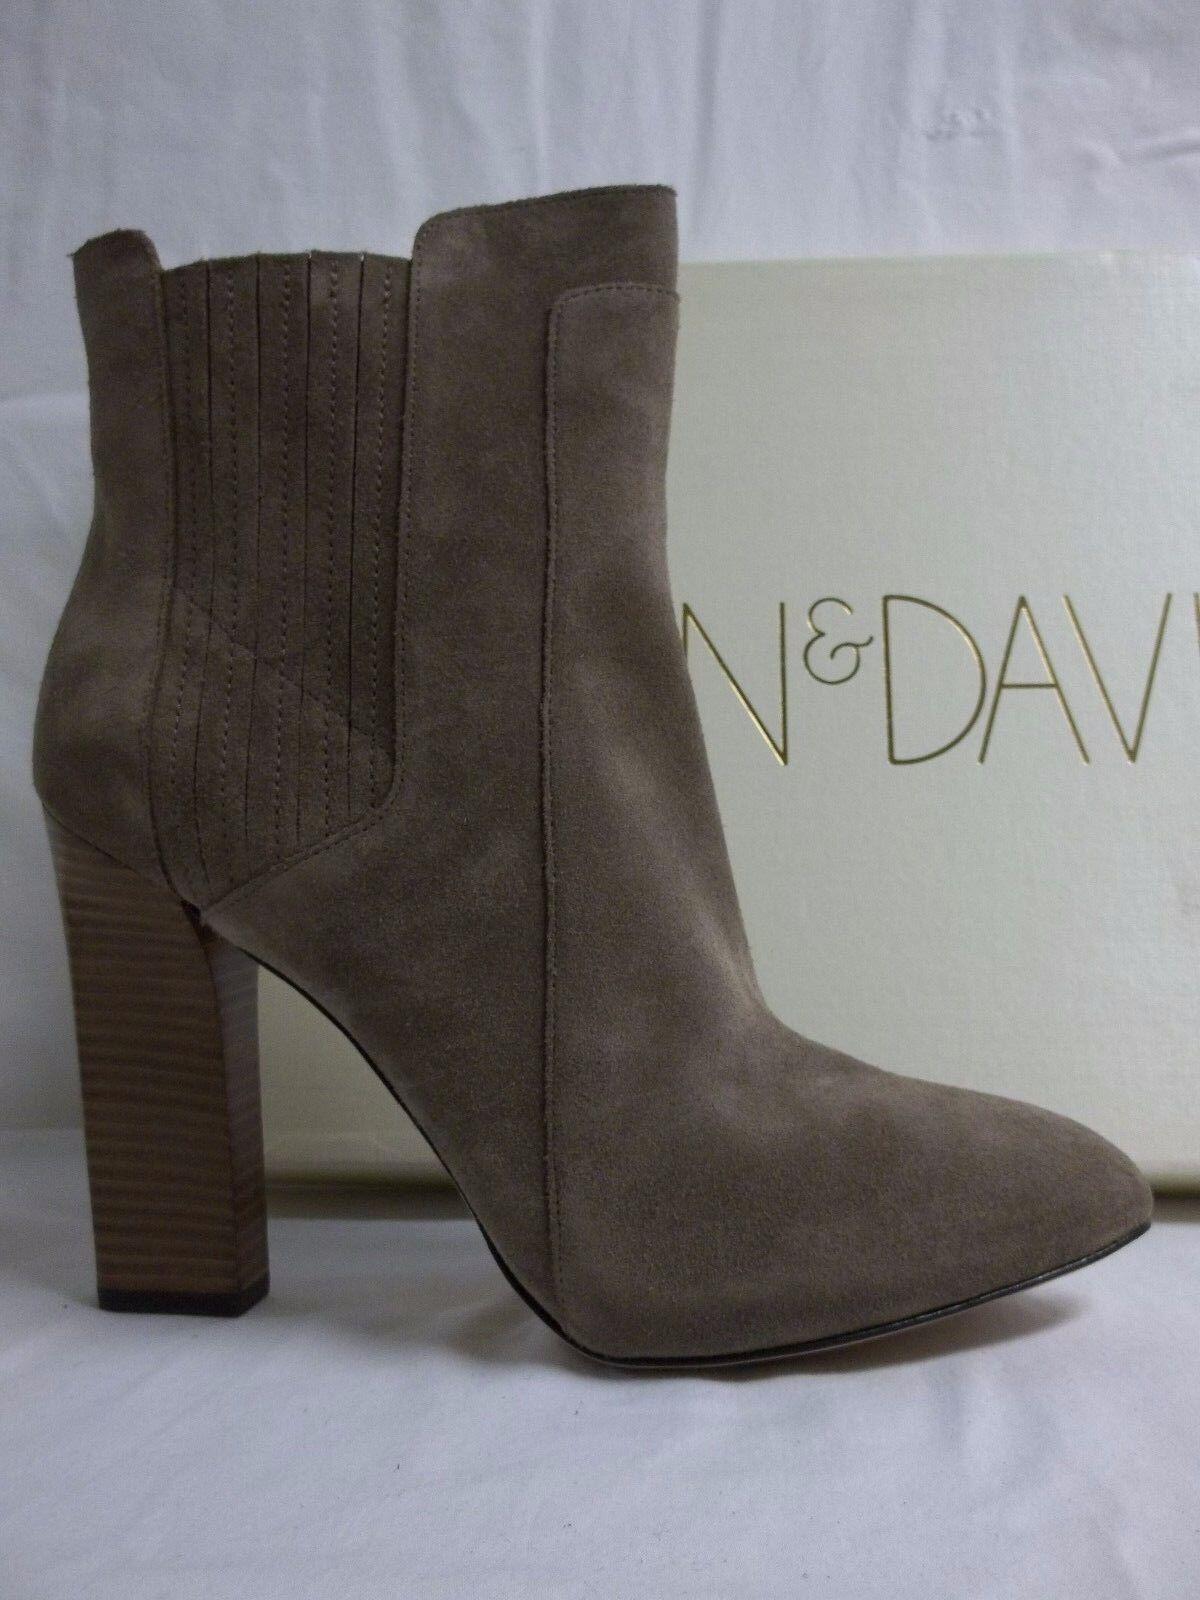 Joan & David Größe 11 M Praxy Taupe Suede Booties Heels NEU Damenschuhe Schuhes